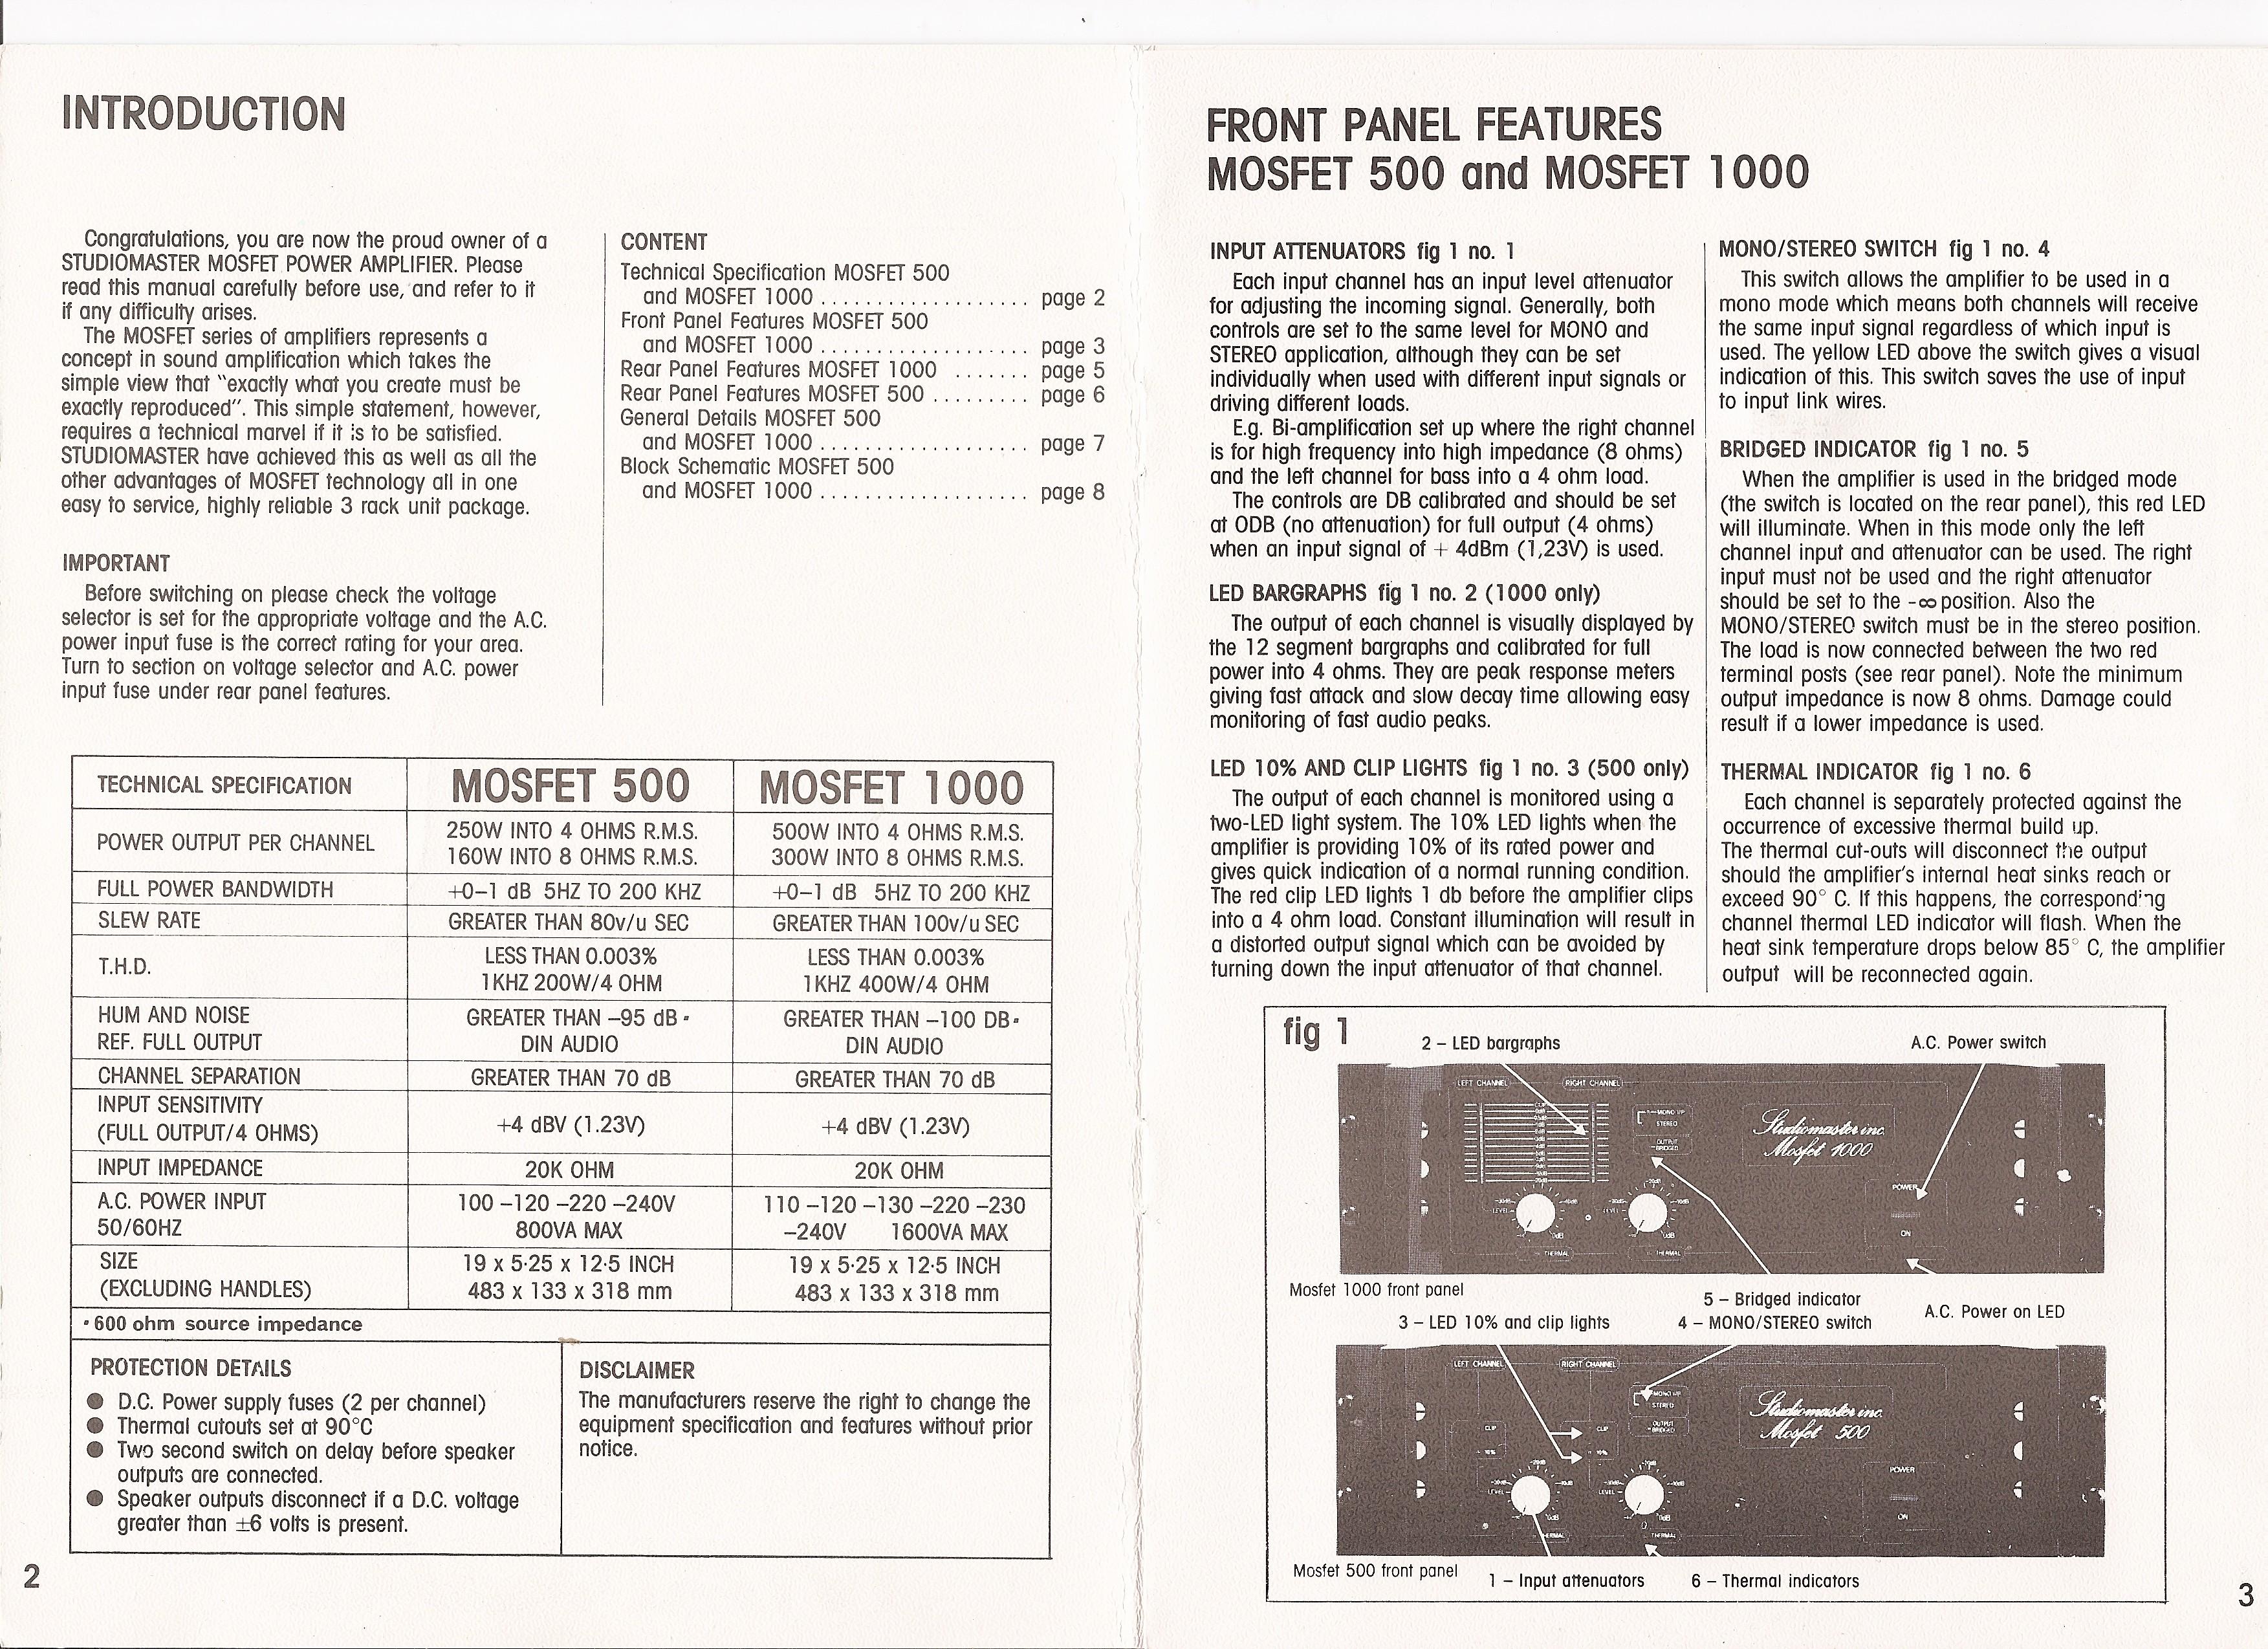 Studiomaster Power Amplifier Gearslutz Mosfet Amp 764